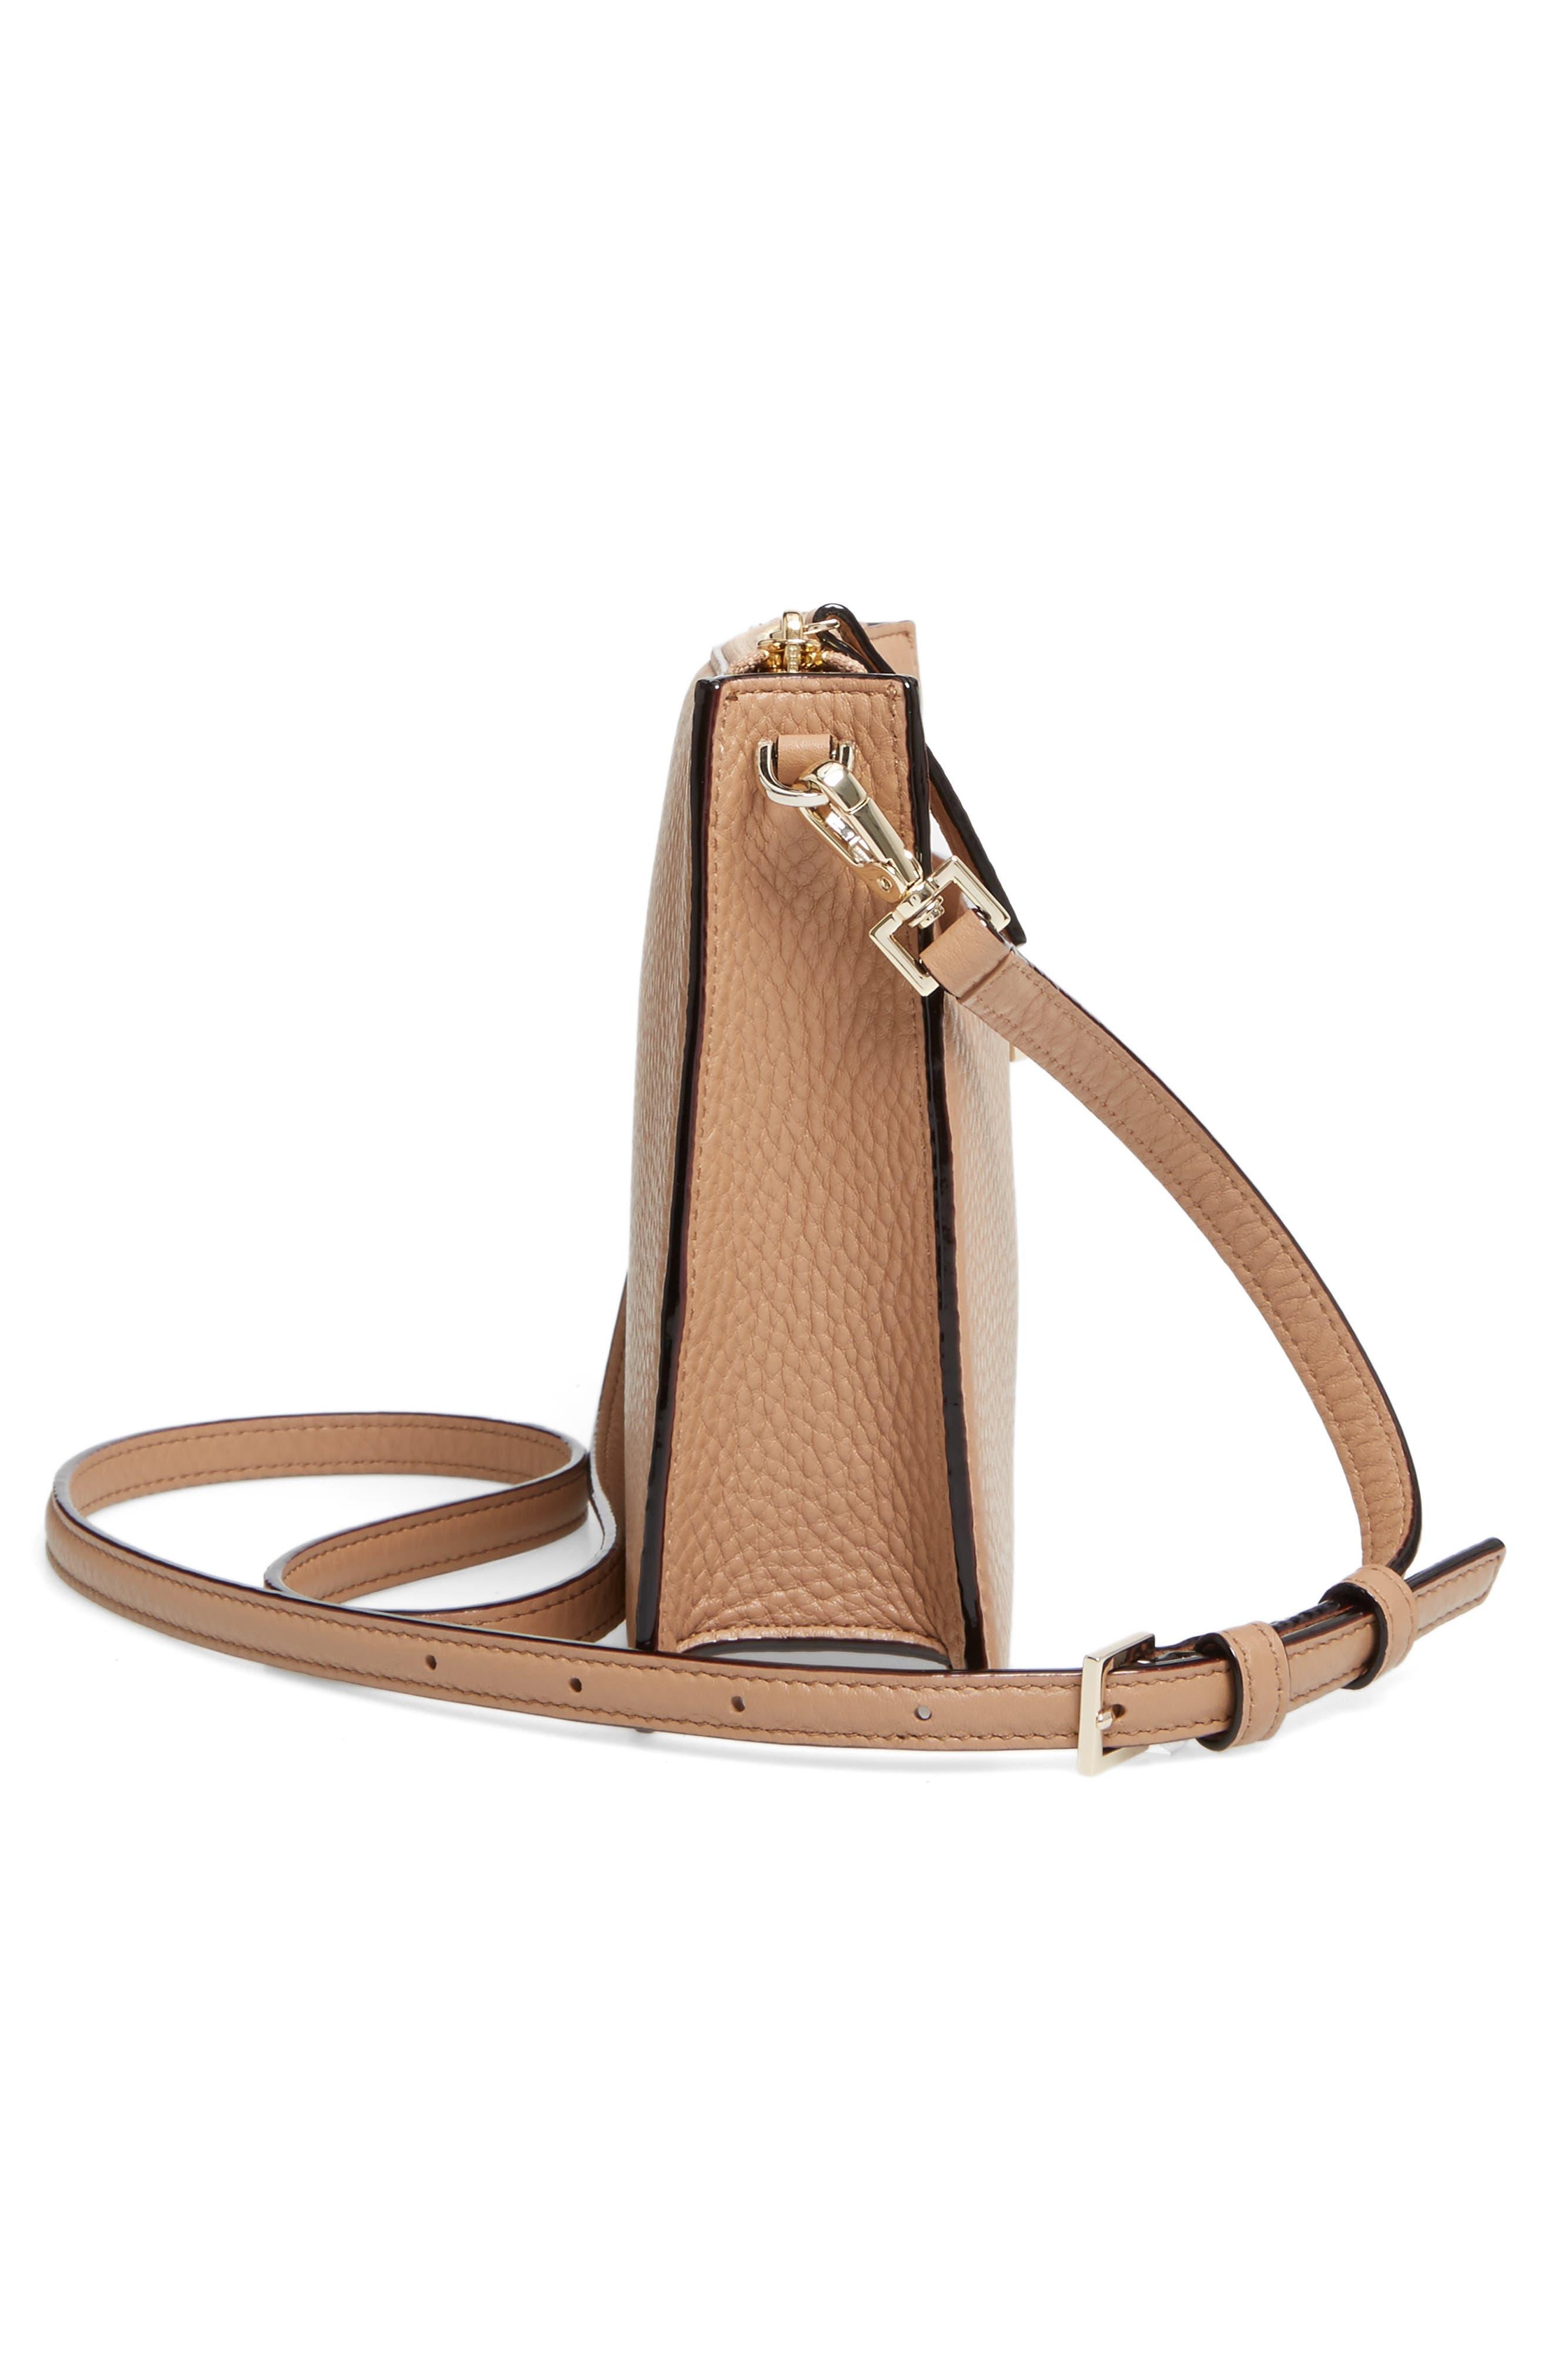 steward street clarise leather shoulder bag,                             Alternate thumbnail 14, color,